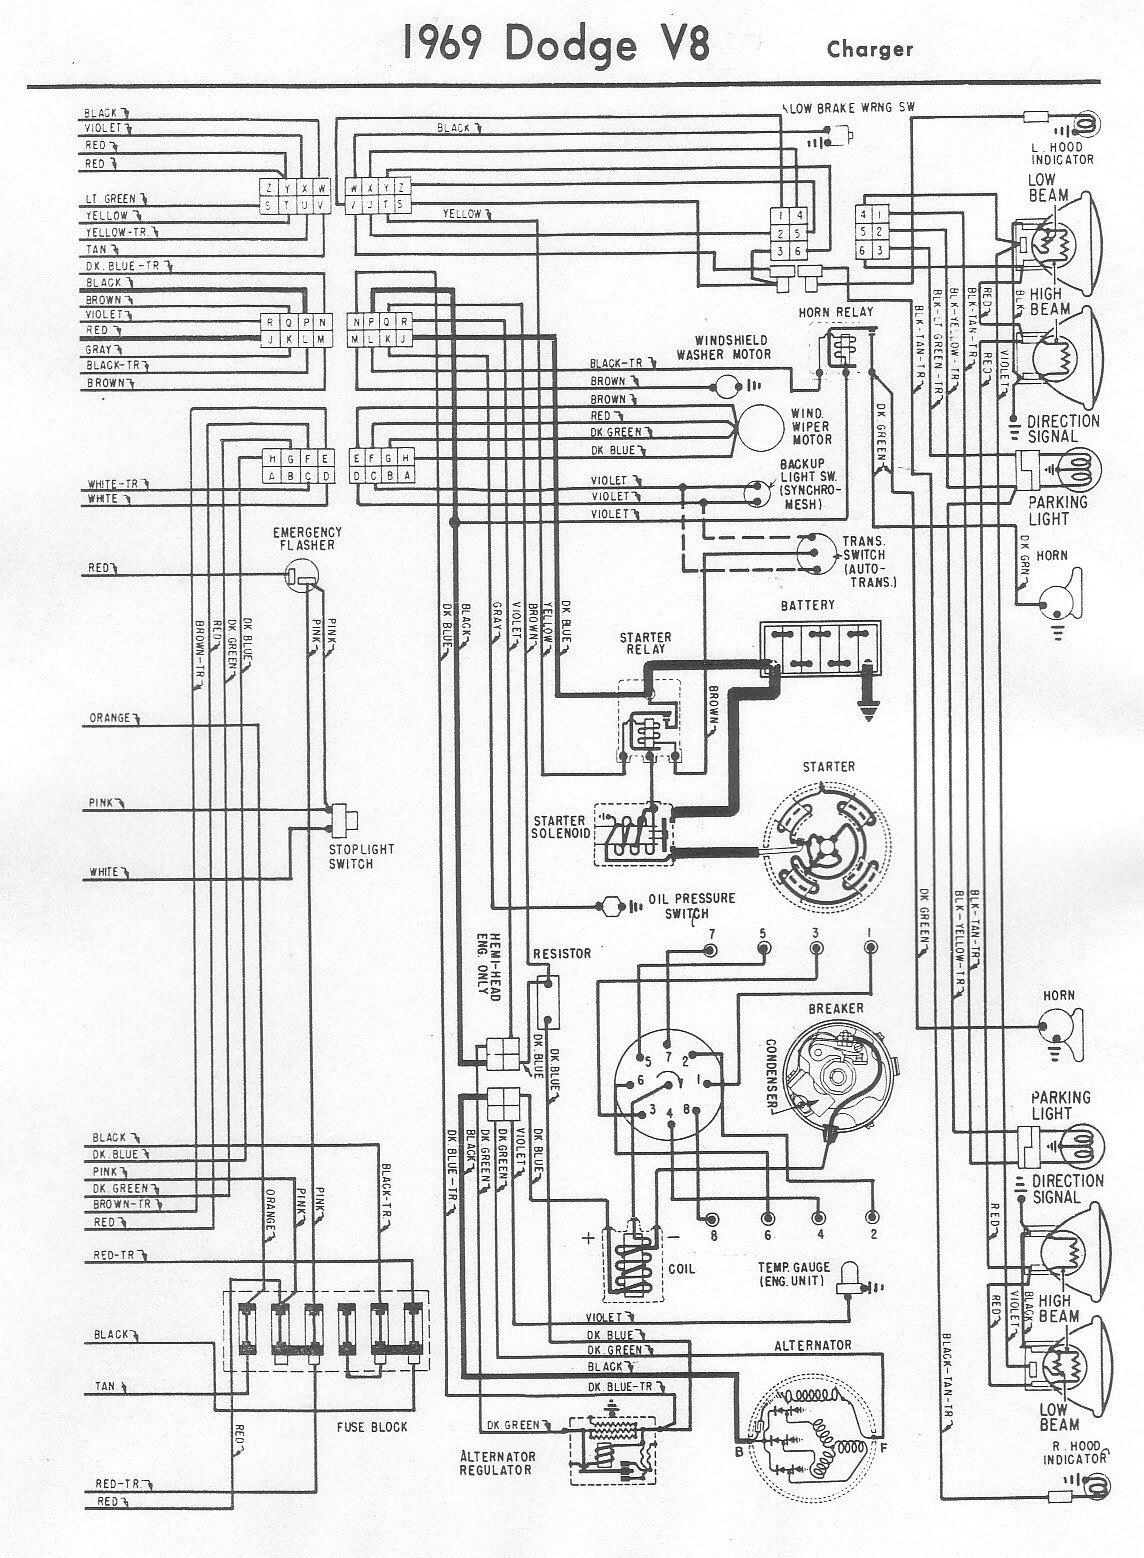 Diagram 69 Coronet Wiring Diagram Full Version Hd Quality Wiring Diagram Diagramssauve Tomari It